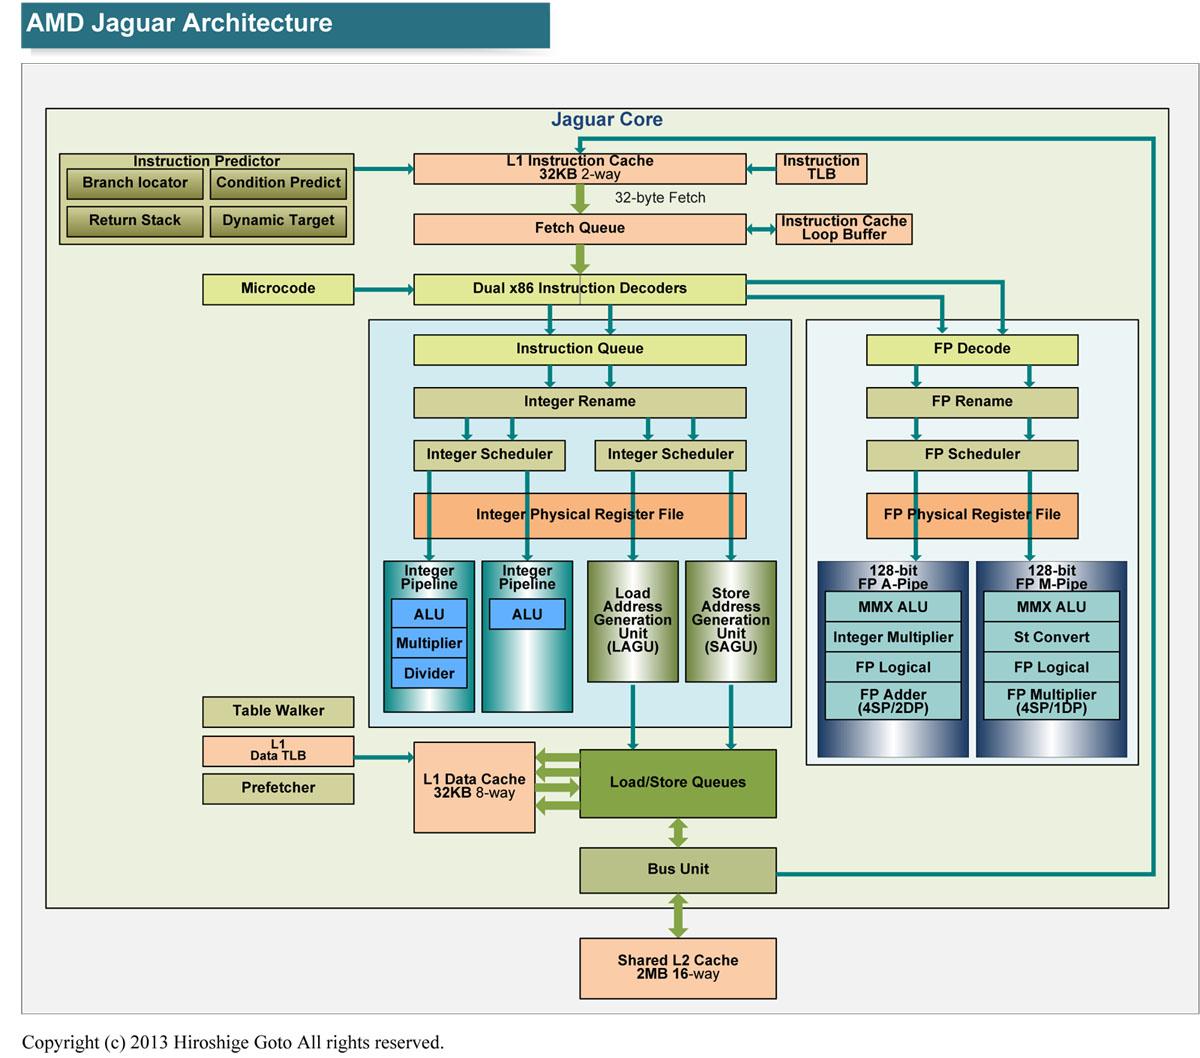 "Jaguarのアーキテクチャ(PDF版は<span class=""img-inline raw""><a href=""/video/pcw/docs/612/762/p09.pdf"" ipw_status=""1"" ipw_linktype=""filelink_raw"" class=""resource"">こちら</a></span>)"